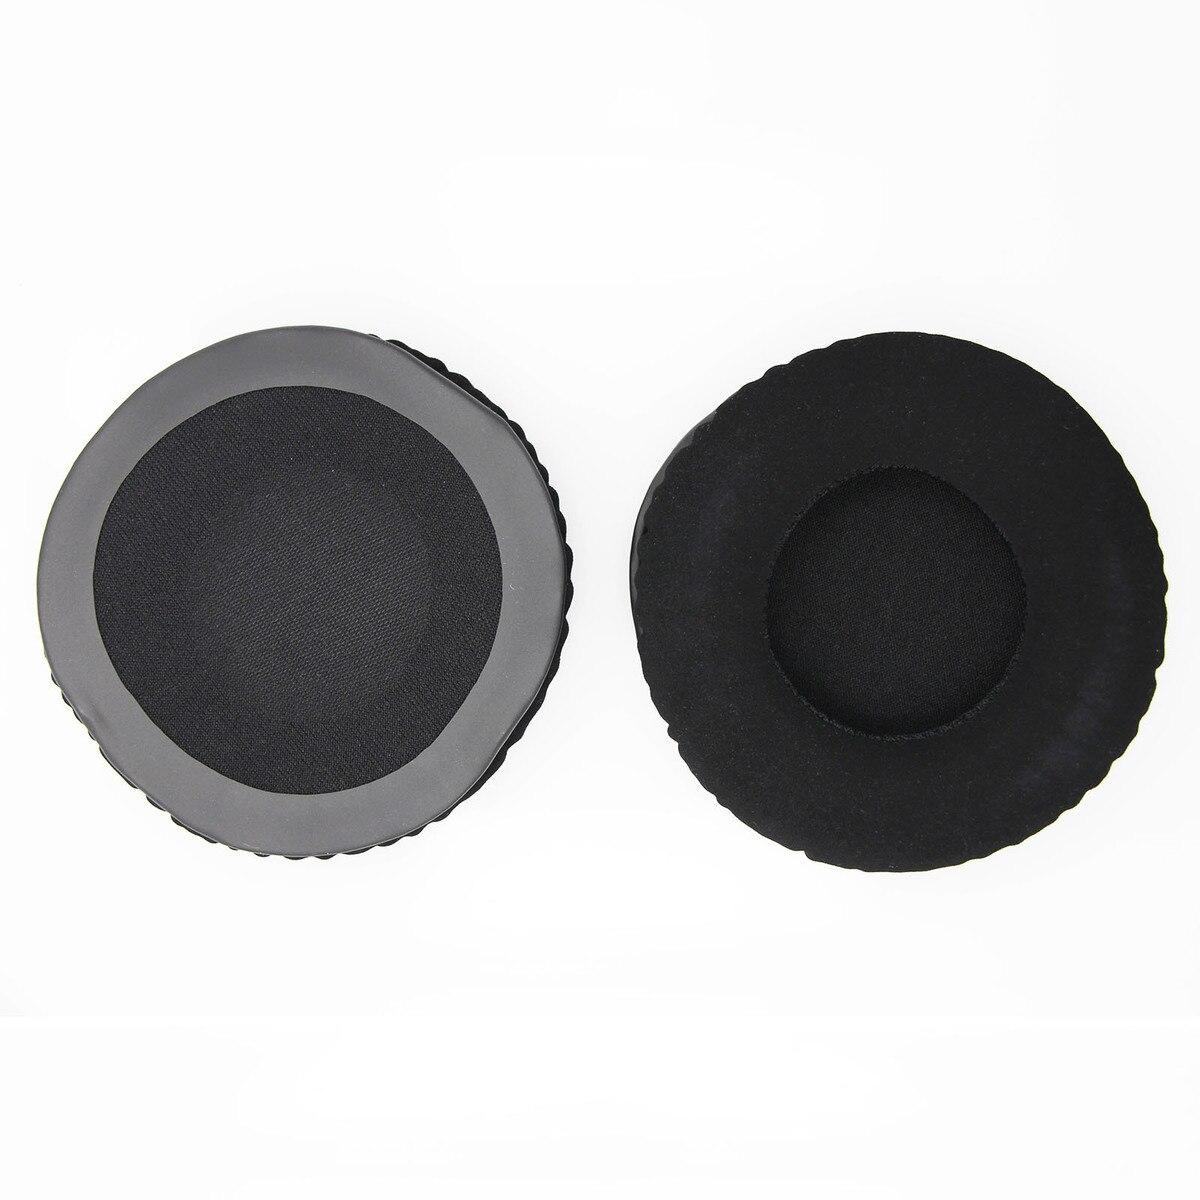 High quality memory foam Ear Cushions Replacement Ear Pads for Sennheiser urbanite headphones enlarge